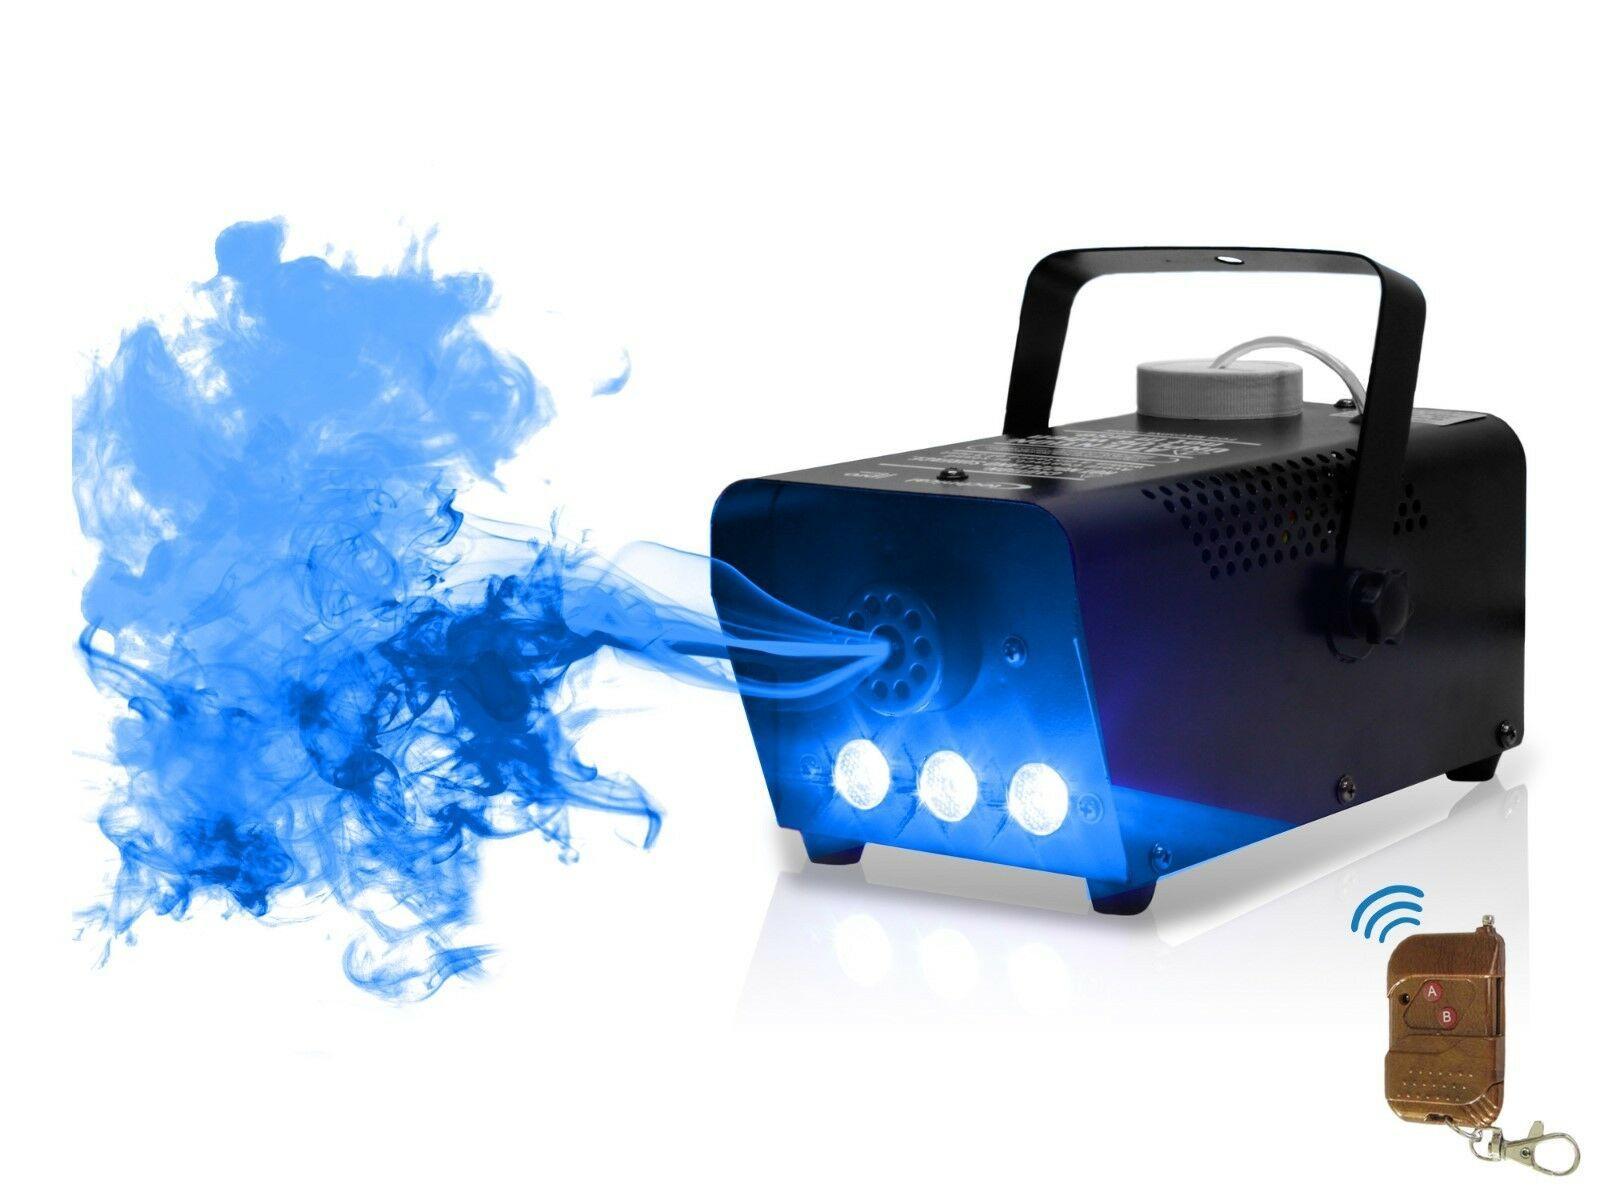 Technical Pro FOGL500R 500 Watt Fog Machine with Wireless Remote Control